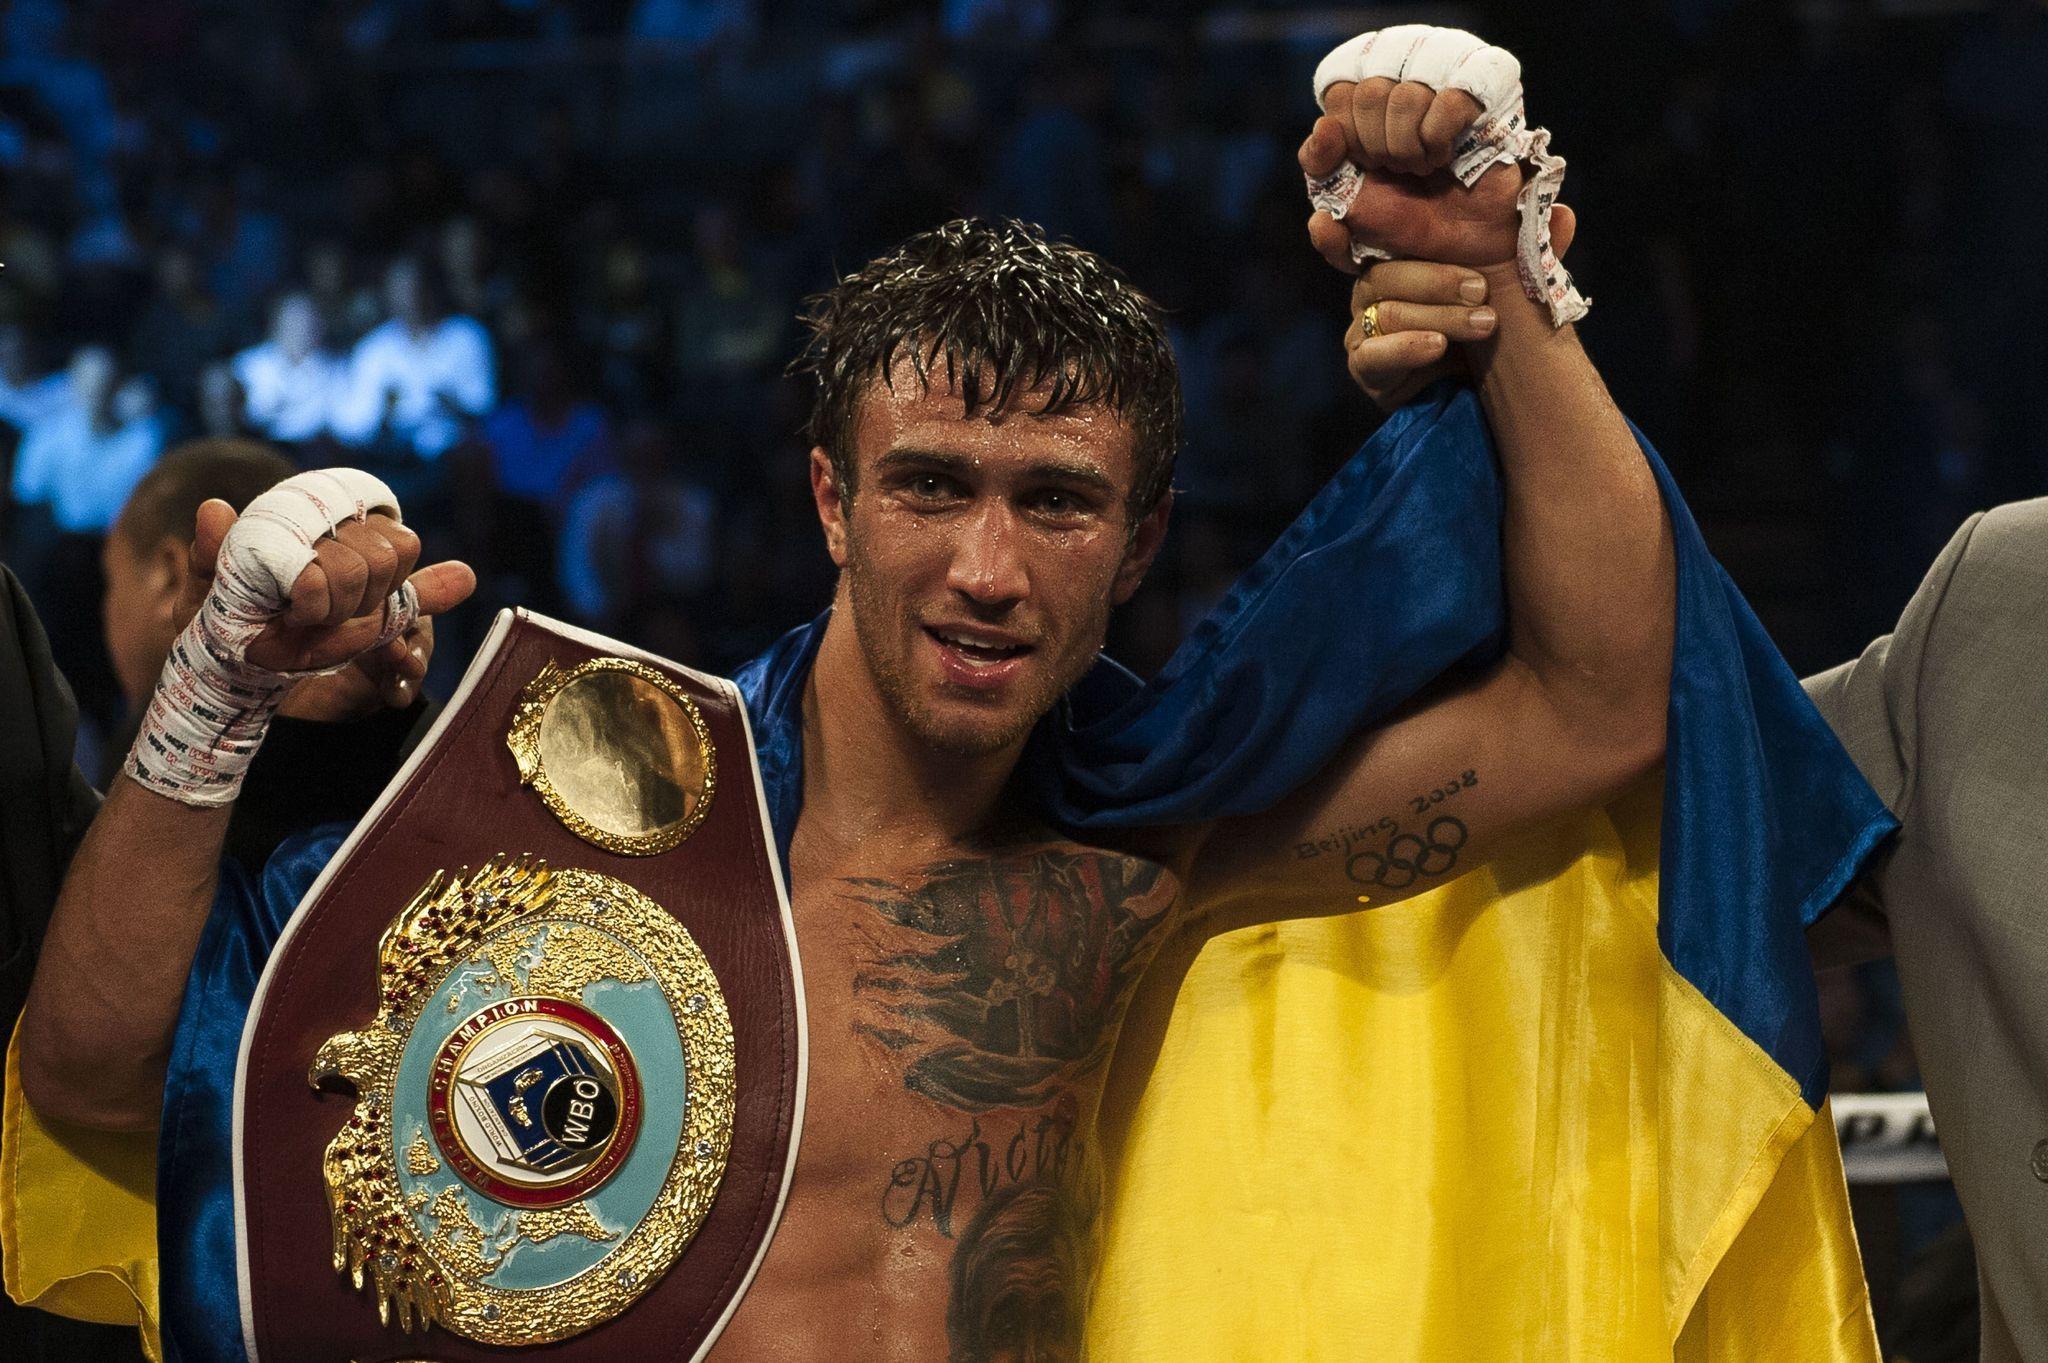 http://www.trbimg.com/img-5471a77b/turbine/la-sp-sn-boxing-vasyl-lomachenko-pacquiao-20141123